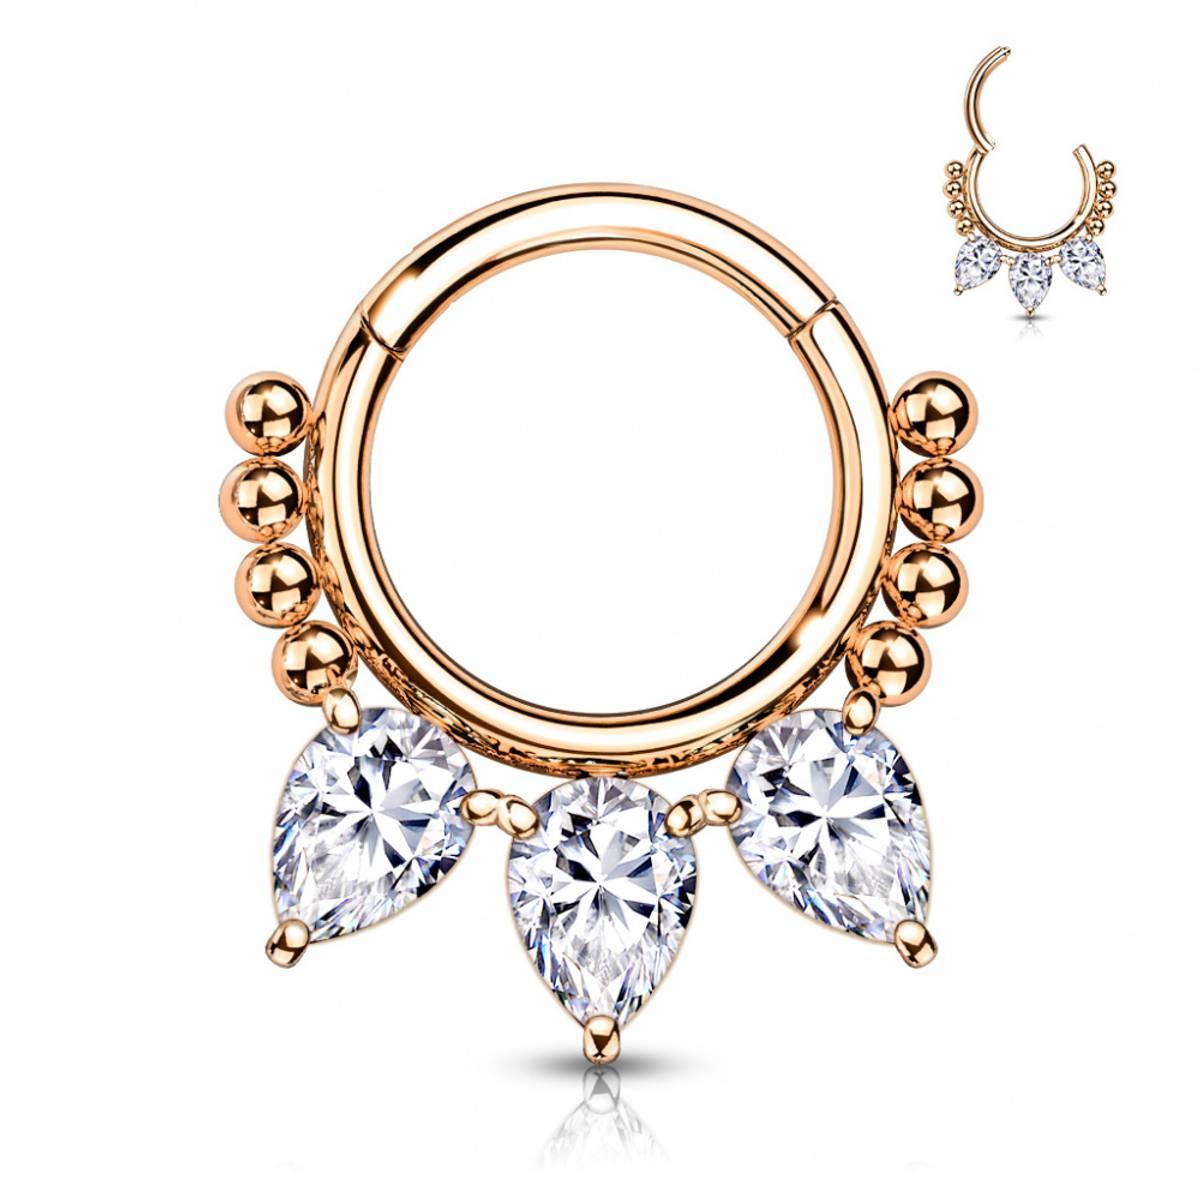 Talia Front Facing Hinged Ring Rose Gold